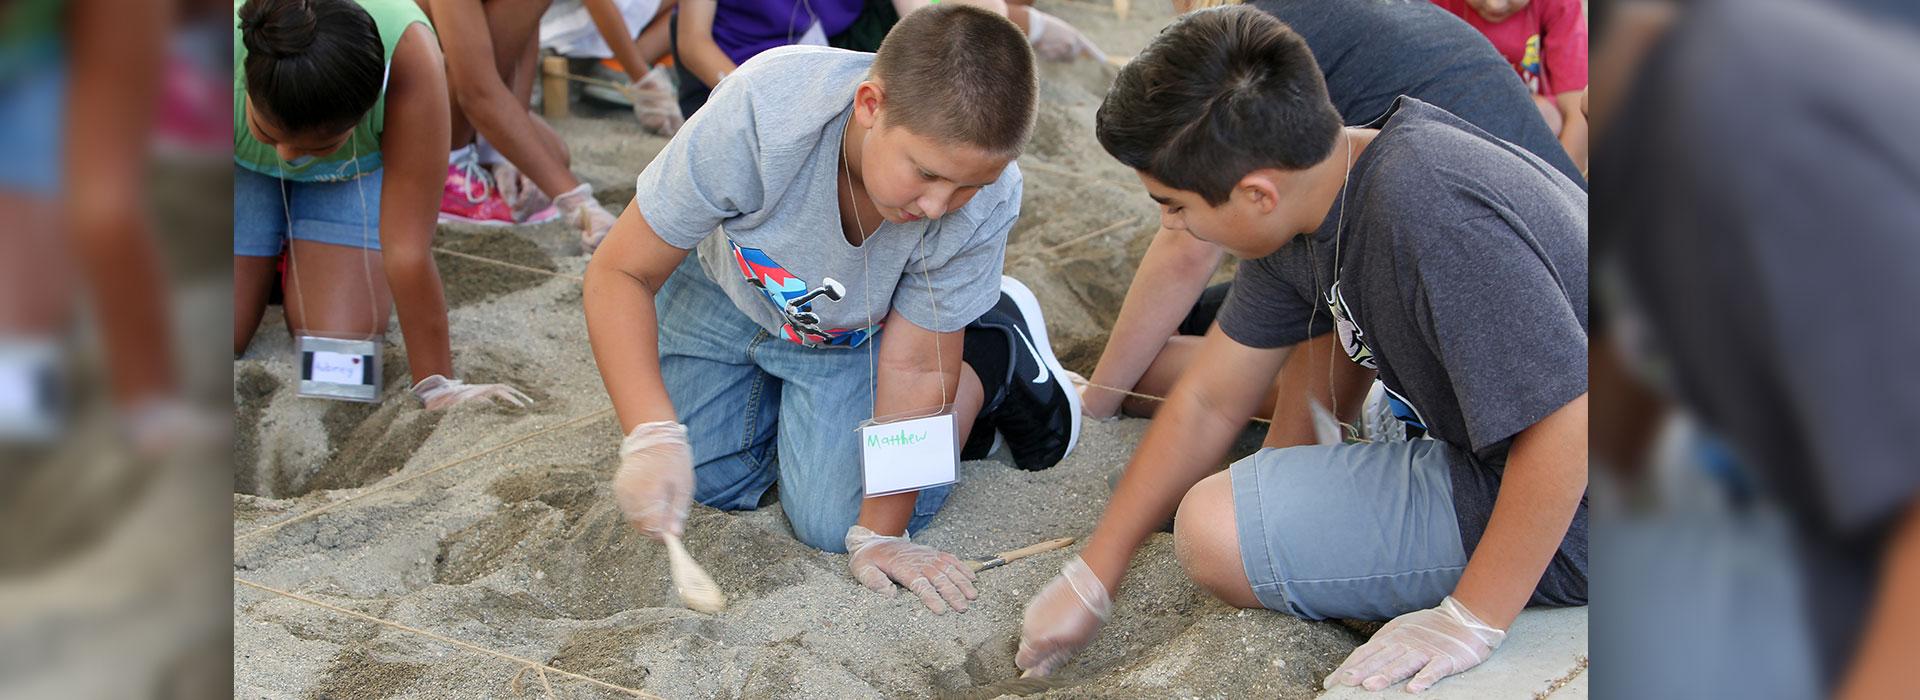 Kids explore ancient Egypt during summer workshop at CSUSB art museum